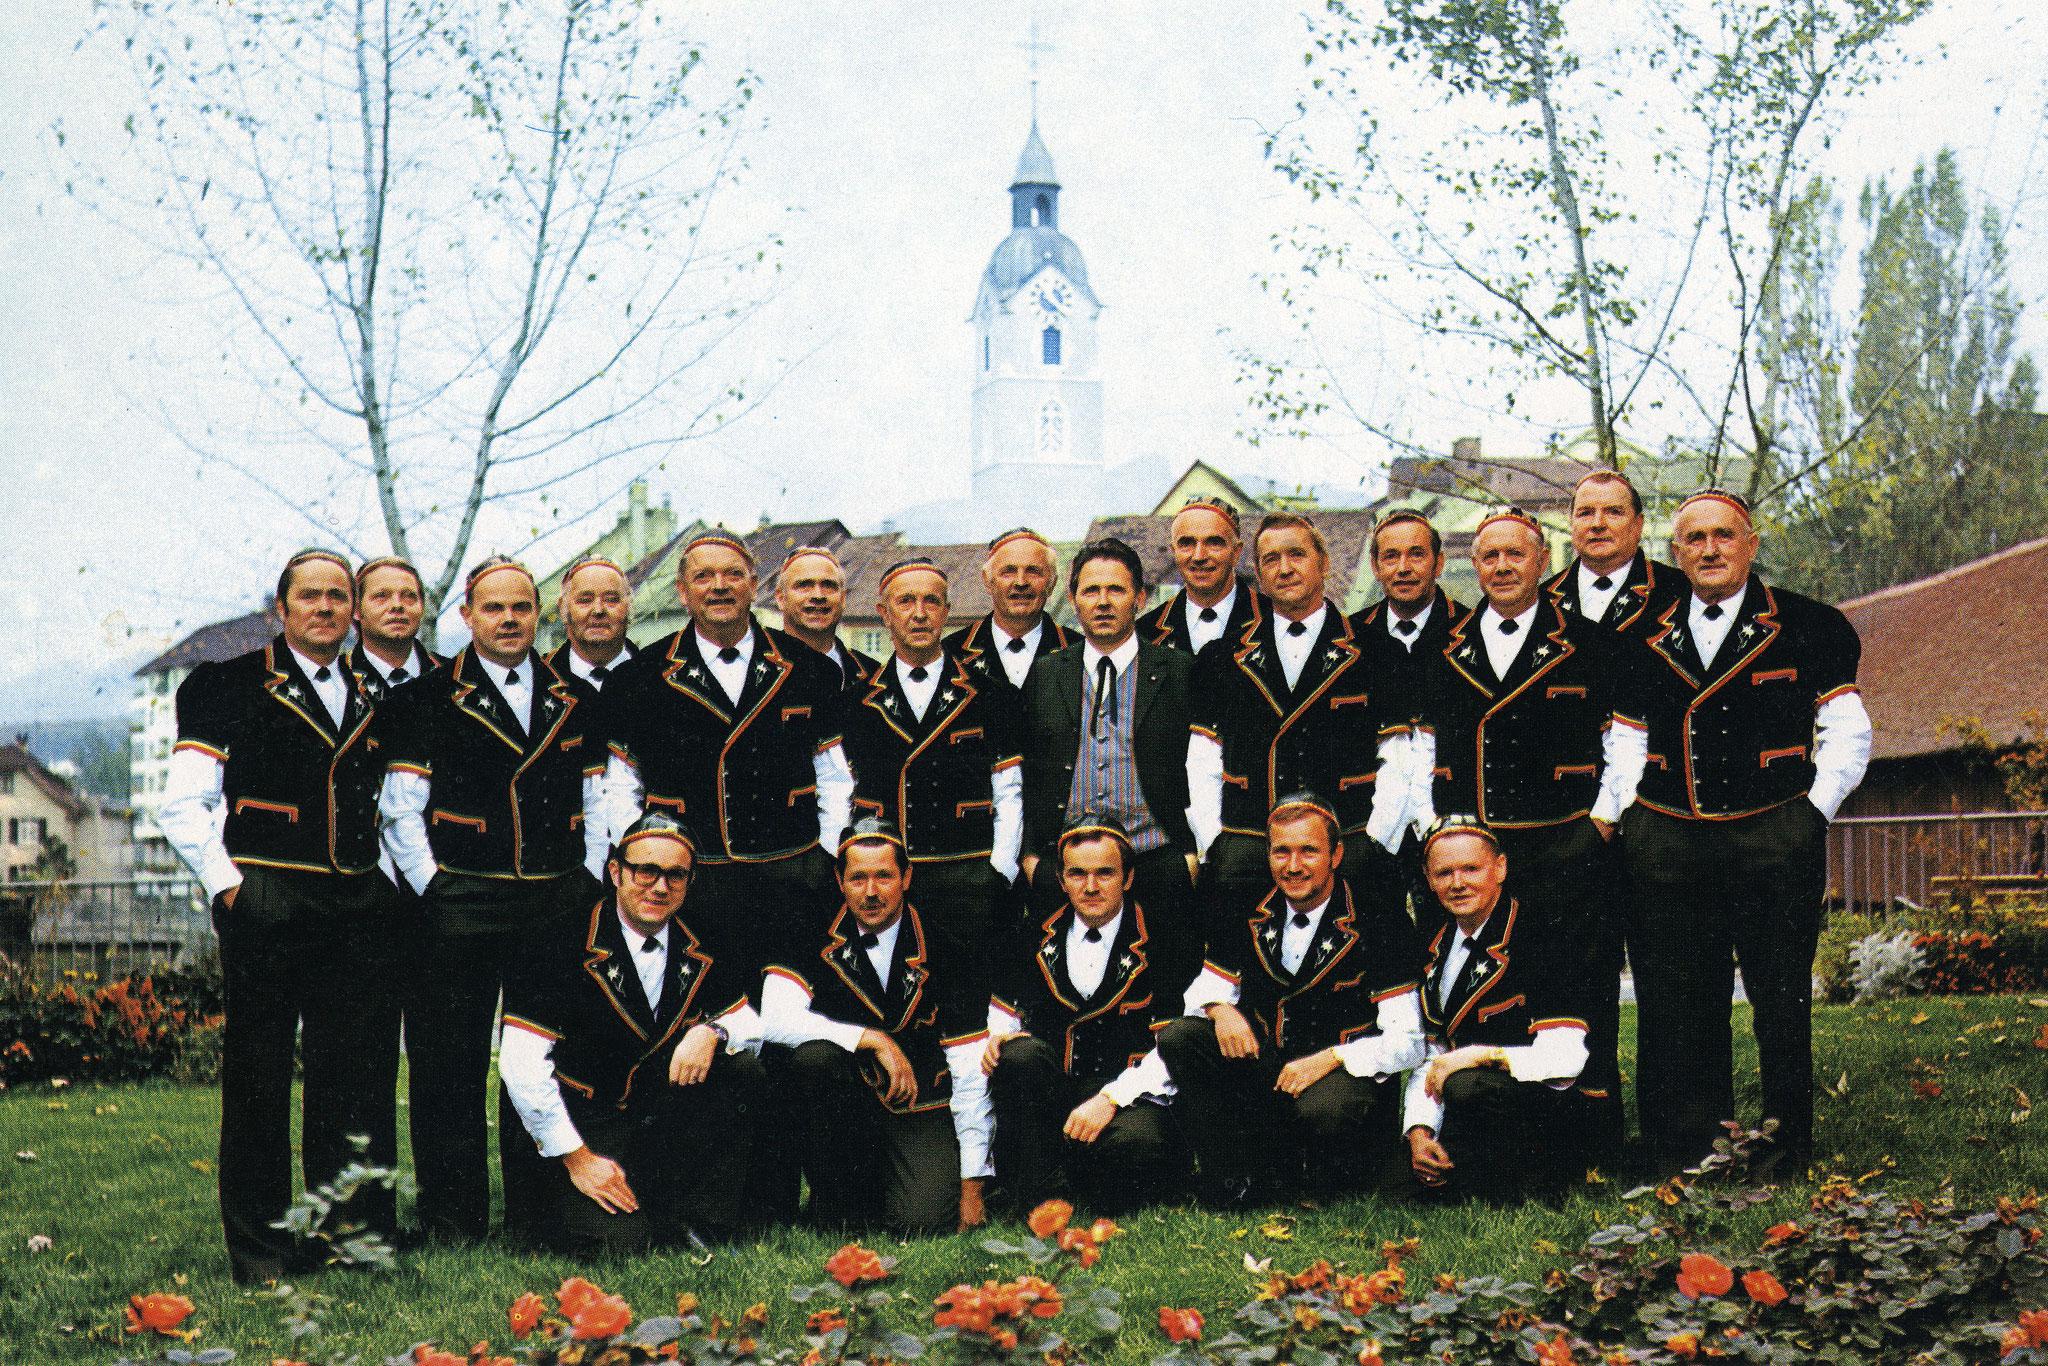 Plattentaufe 1977